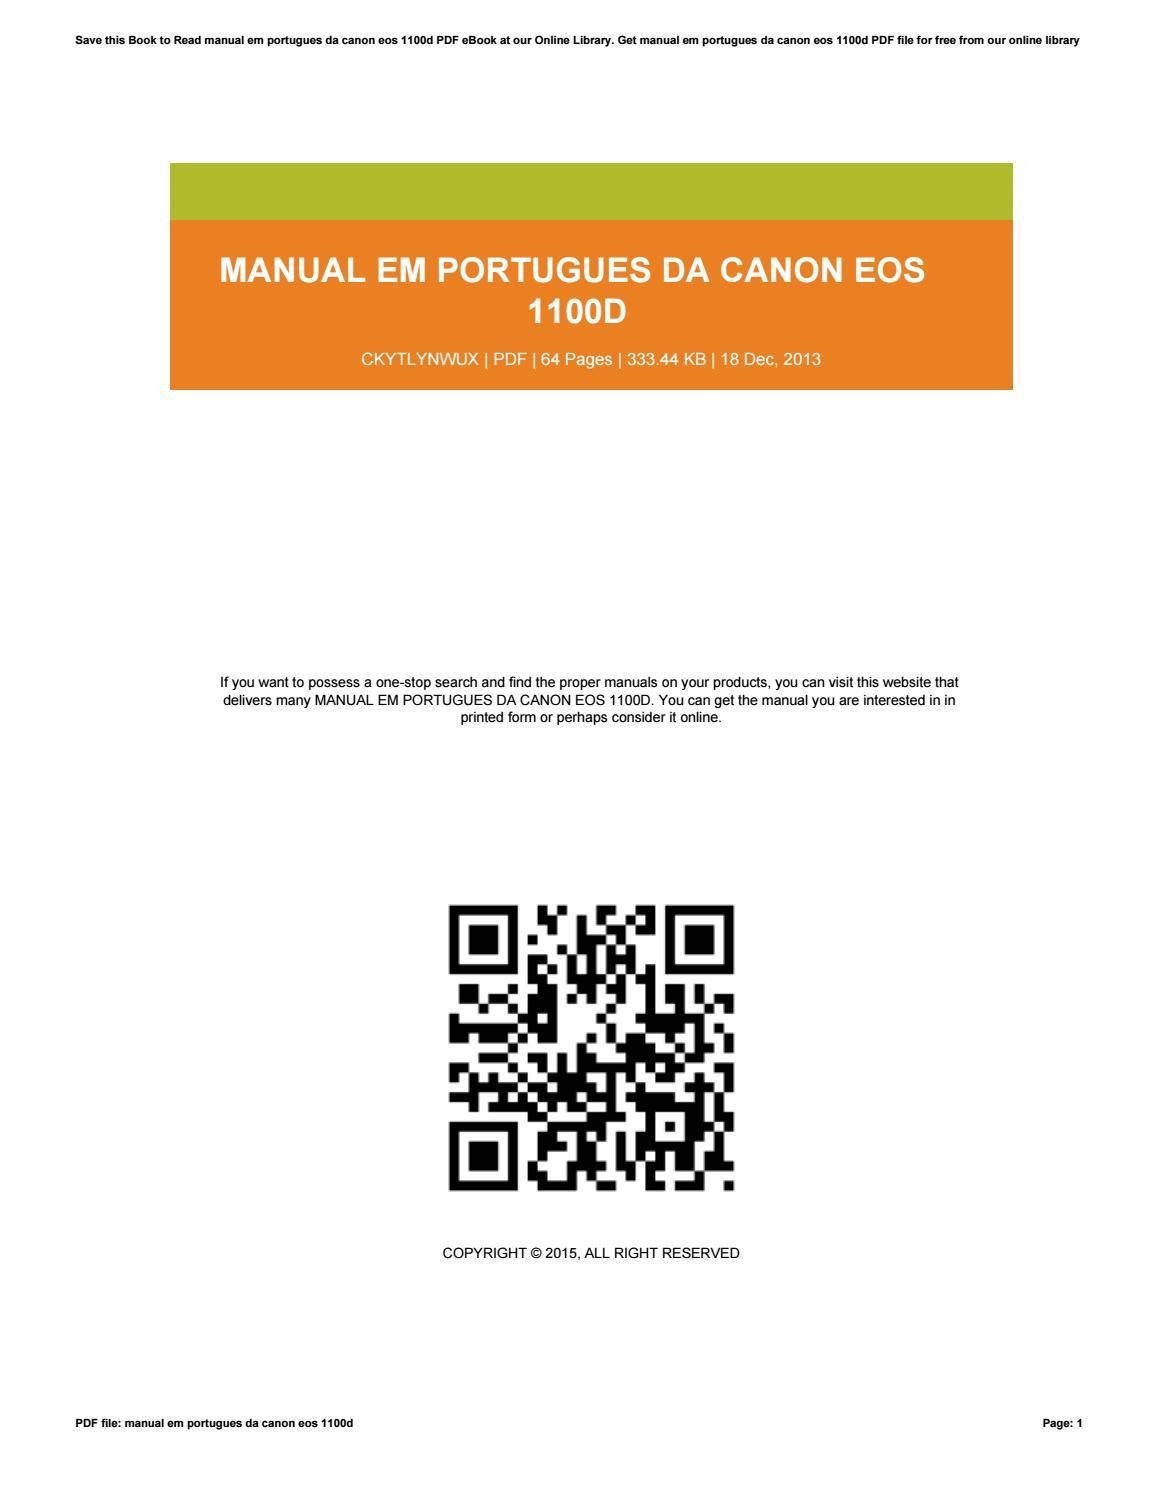 manual em portugues da canon eos 1100d by marilynsmith3329 issuu rh issuu com Canon EOS Rebel T3 1100D manual em portugues canon eos 1100d